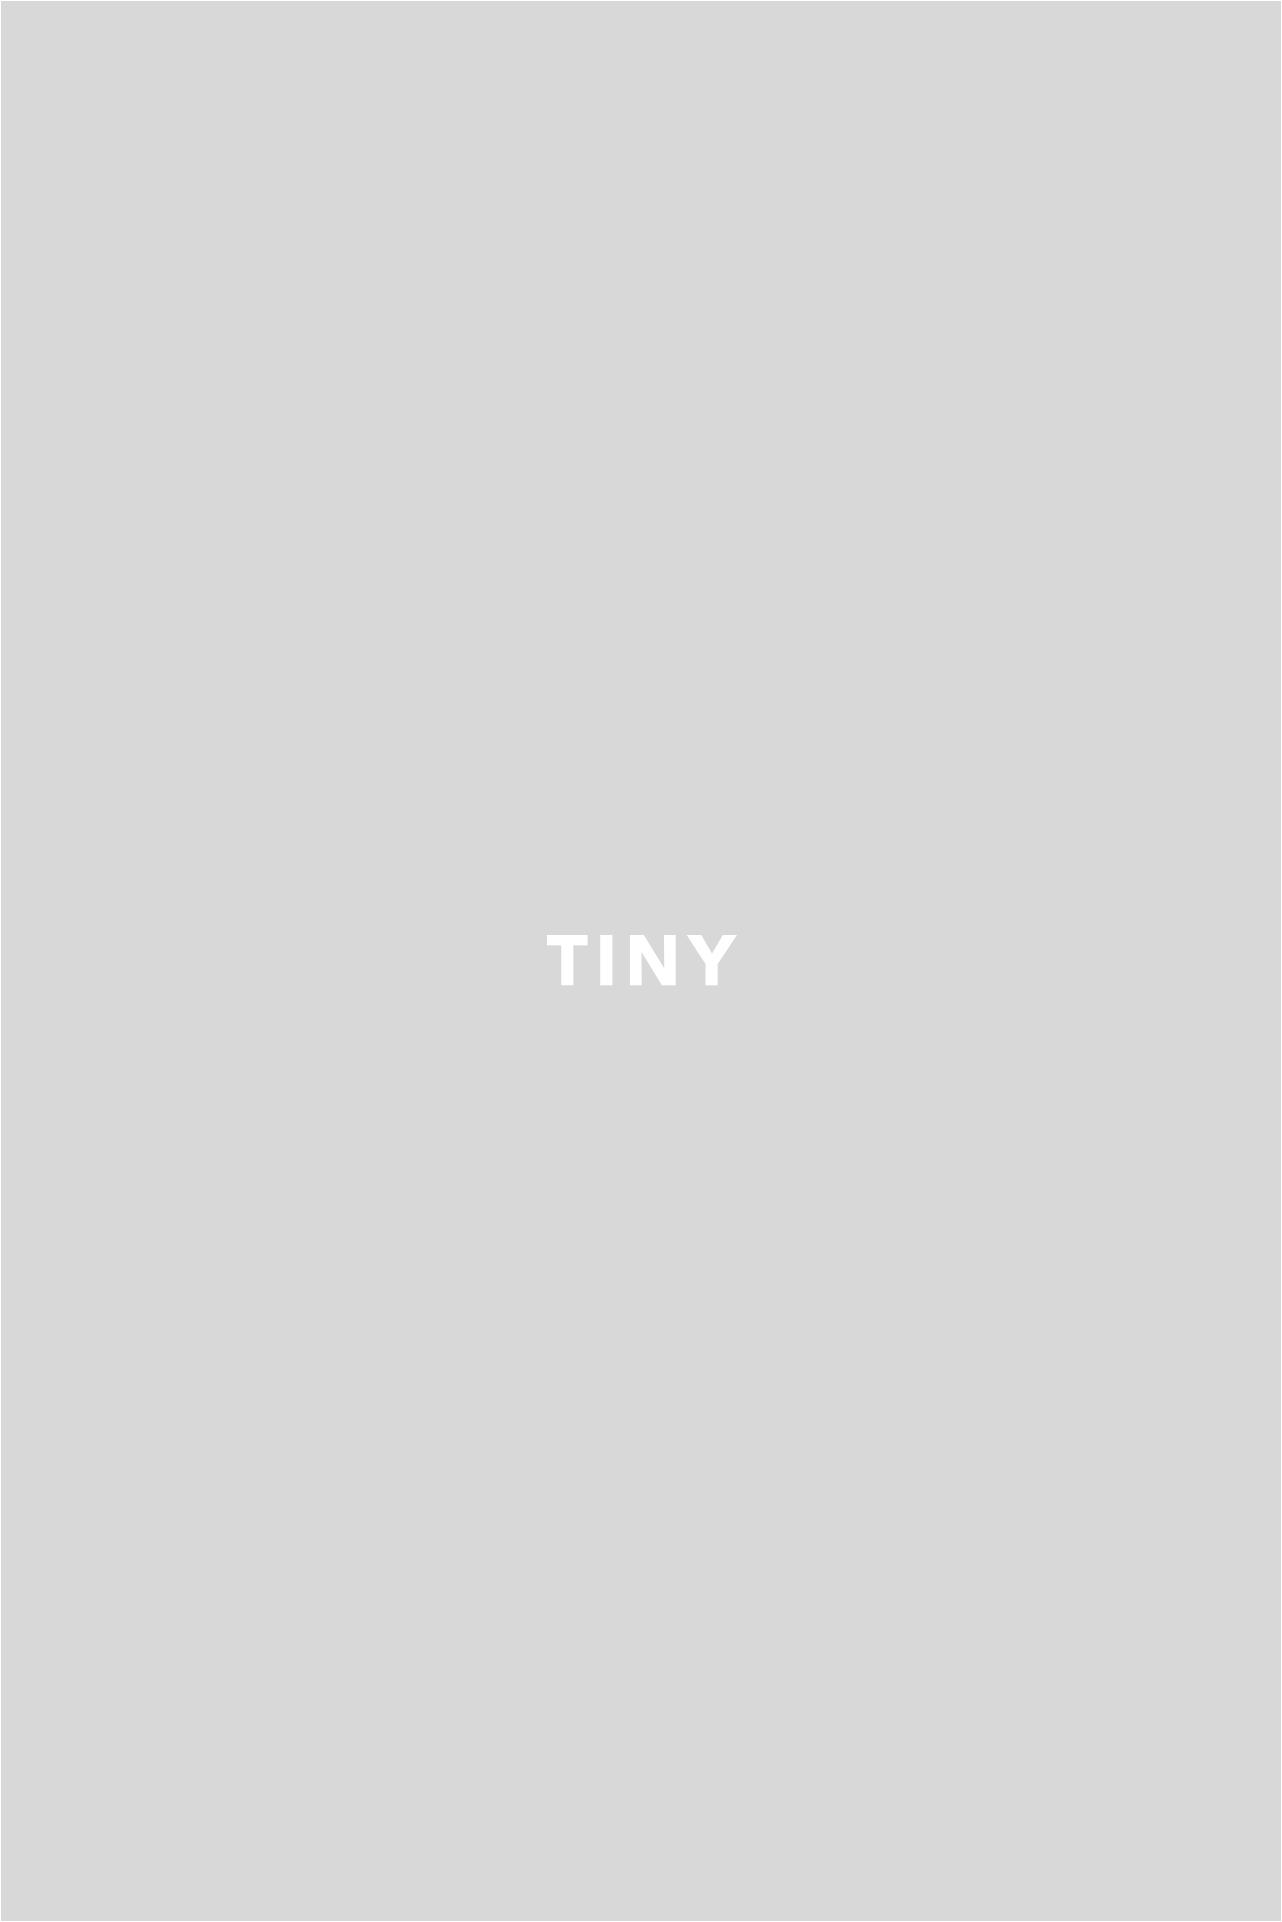 Cargo truck